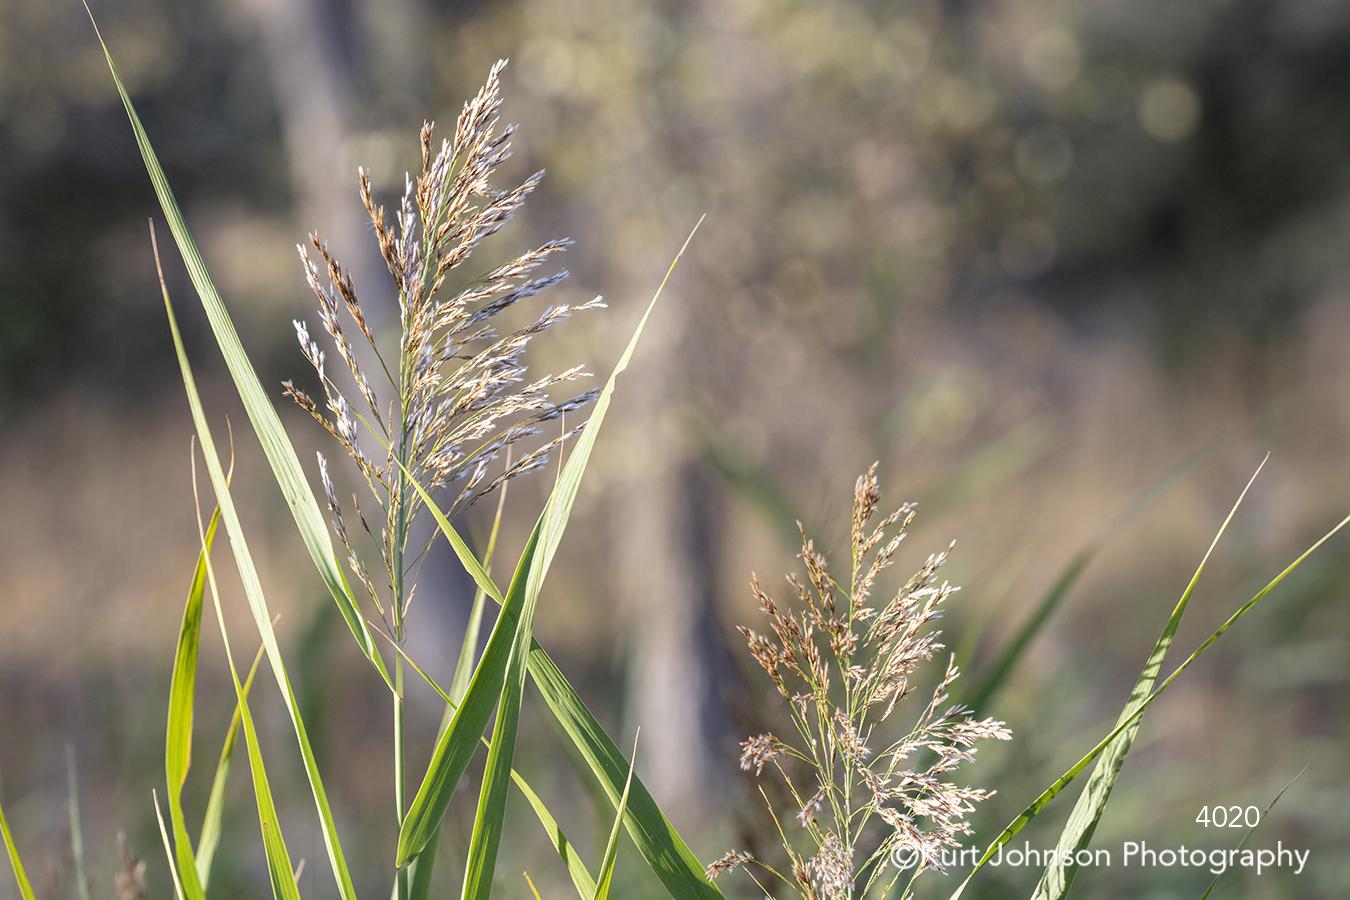 green grass grasses wheat field lines pattern texture close up detail